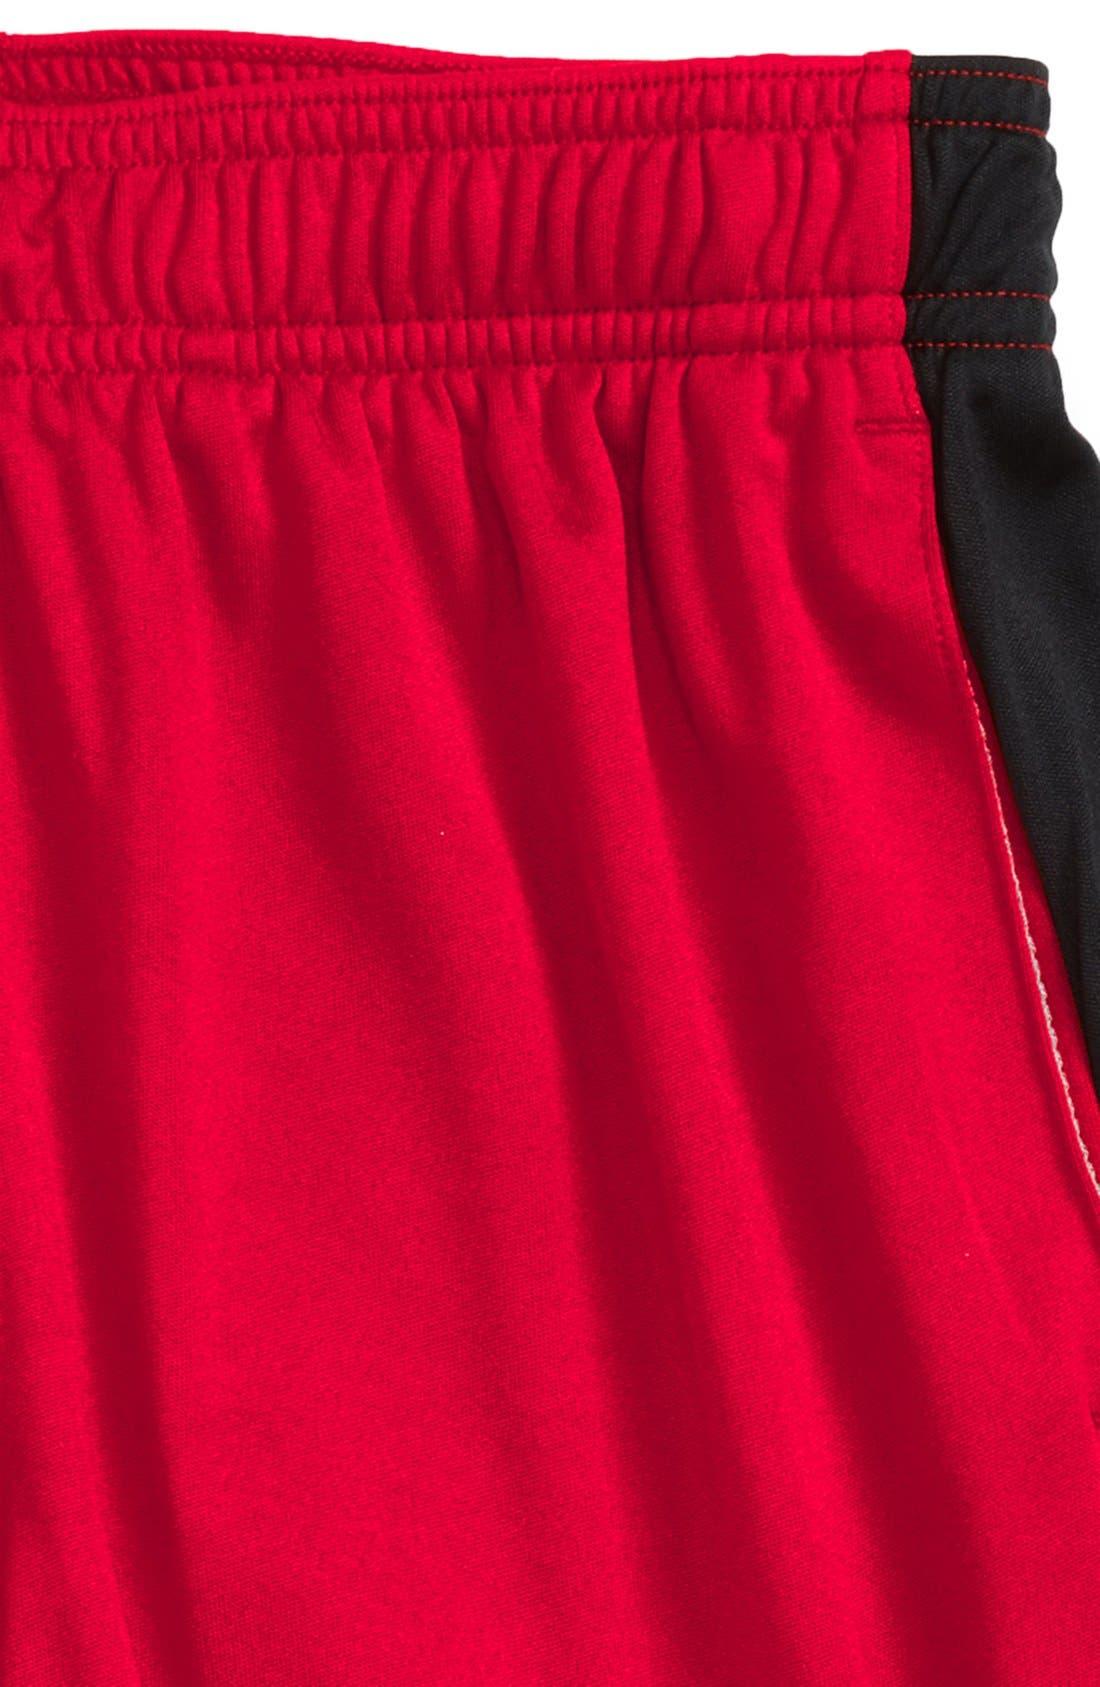 Alternate Image 2  - Under Armour 'Eliminator' HeatGear® Shorts (Big Boys)